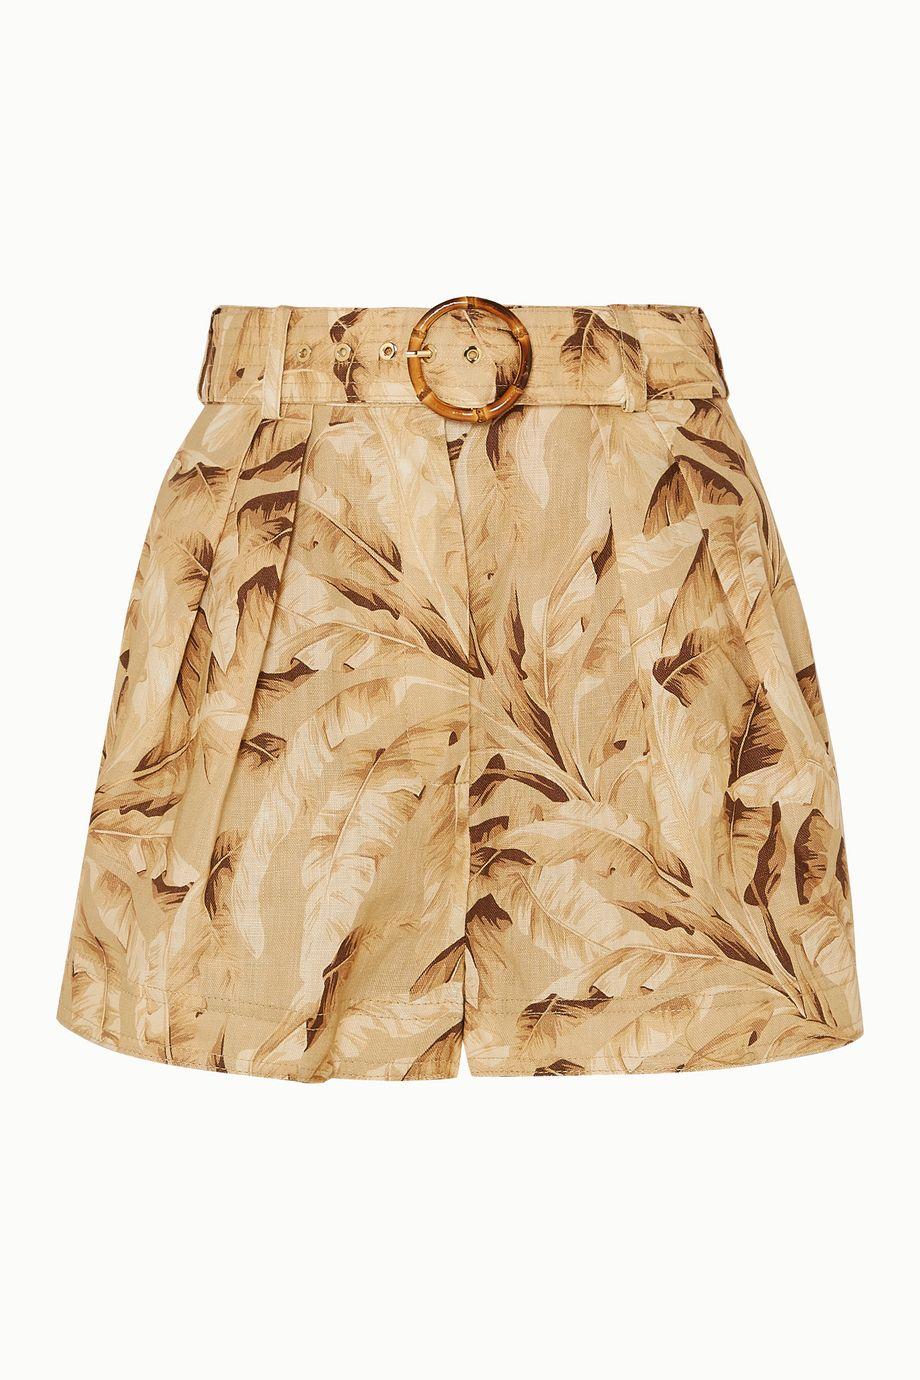 Zimmermann Super Eight belted printed linen shorts